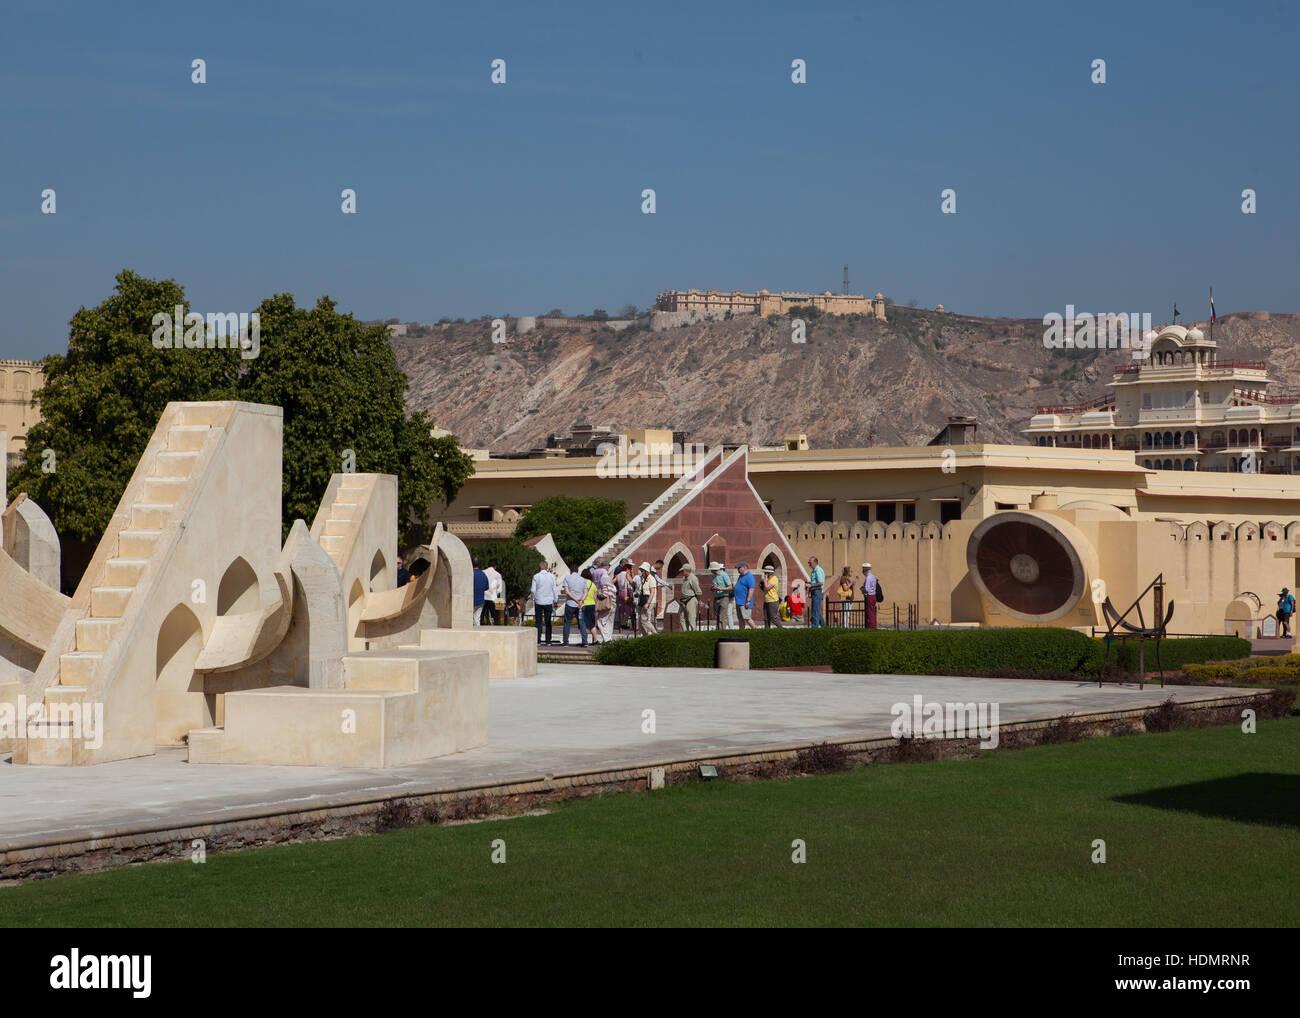 Jantar Mantar Osservatorio Astronomico,Jaipur Rajasthan,l'India Immagini Stock